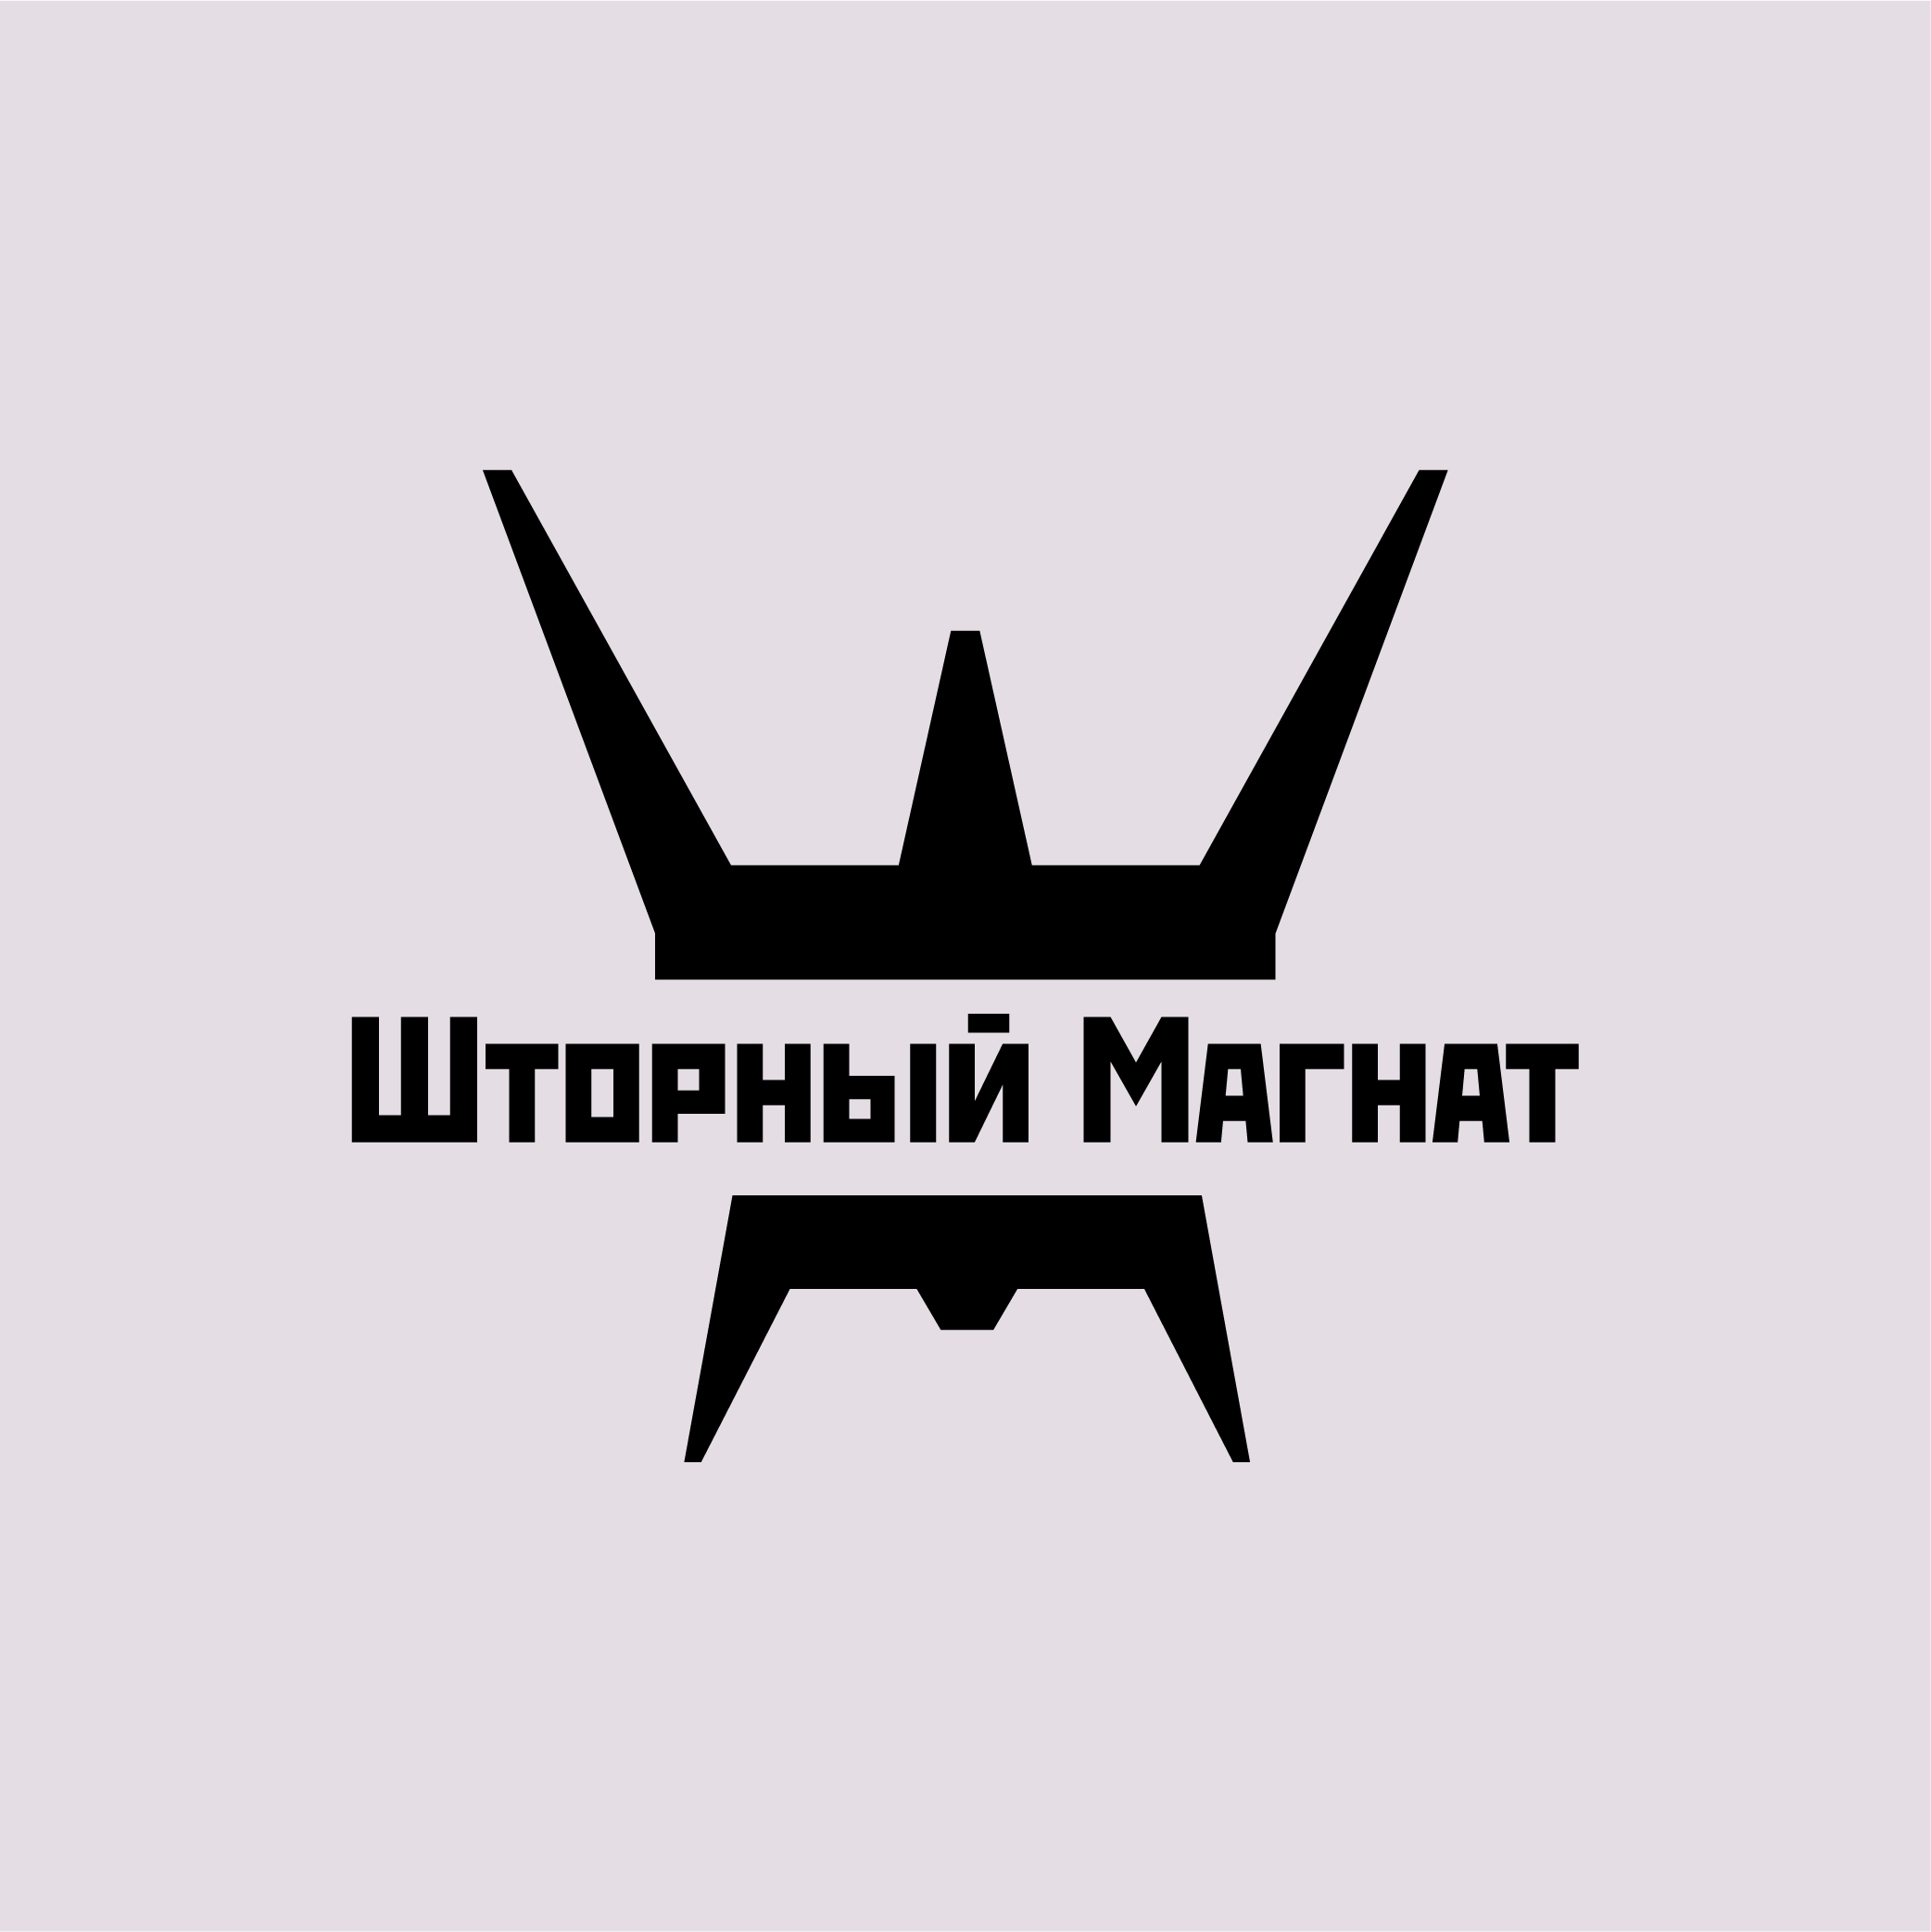 Логотип и фирменный стиль для магазина тканей. фото f_9265cd920f9b7fab.jpg